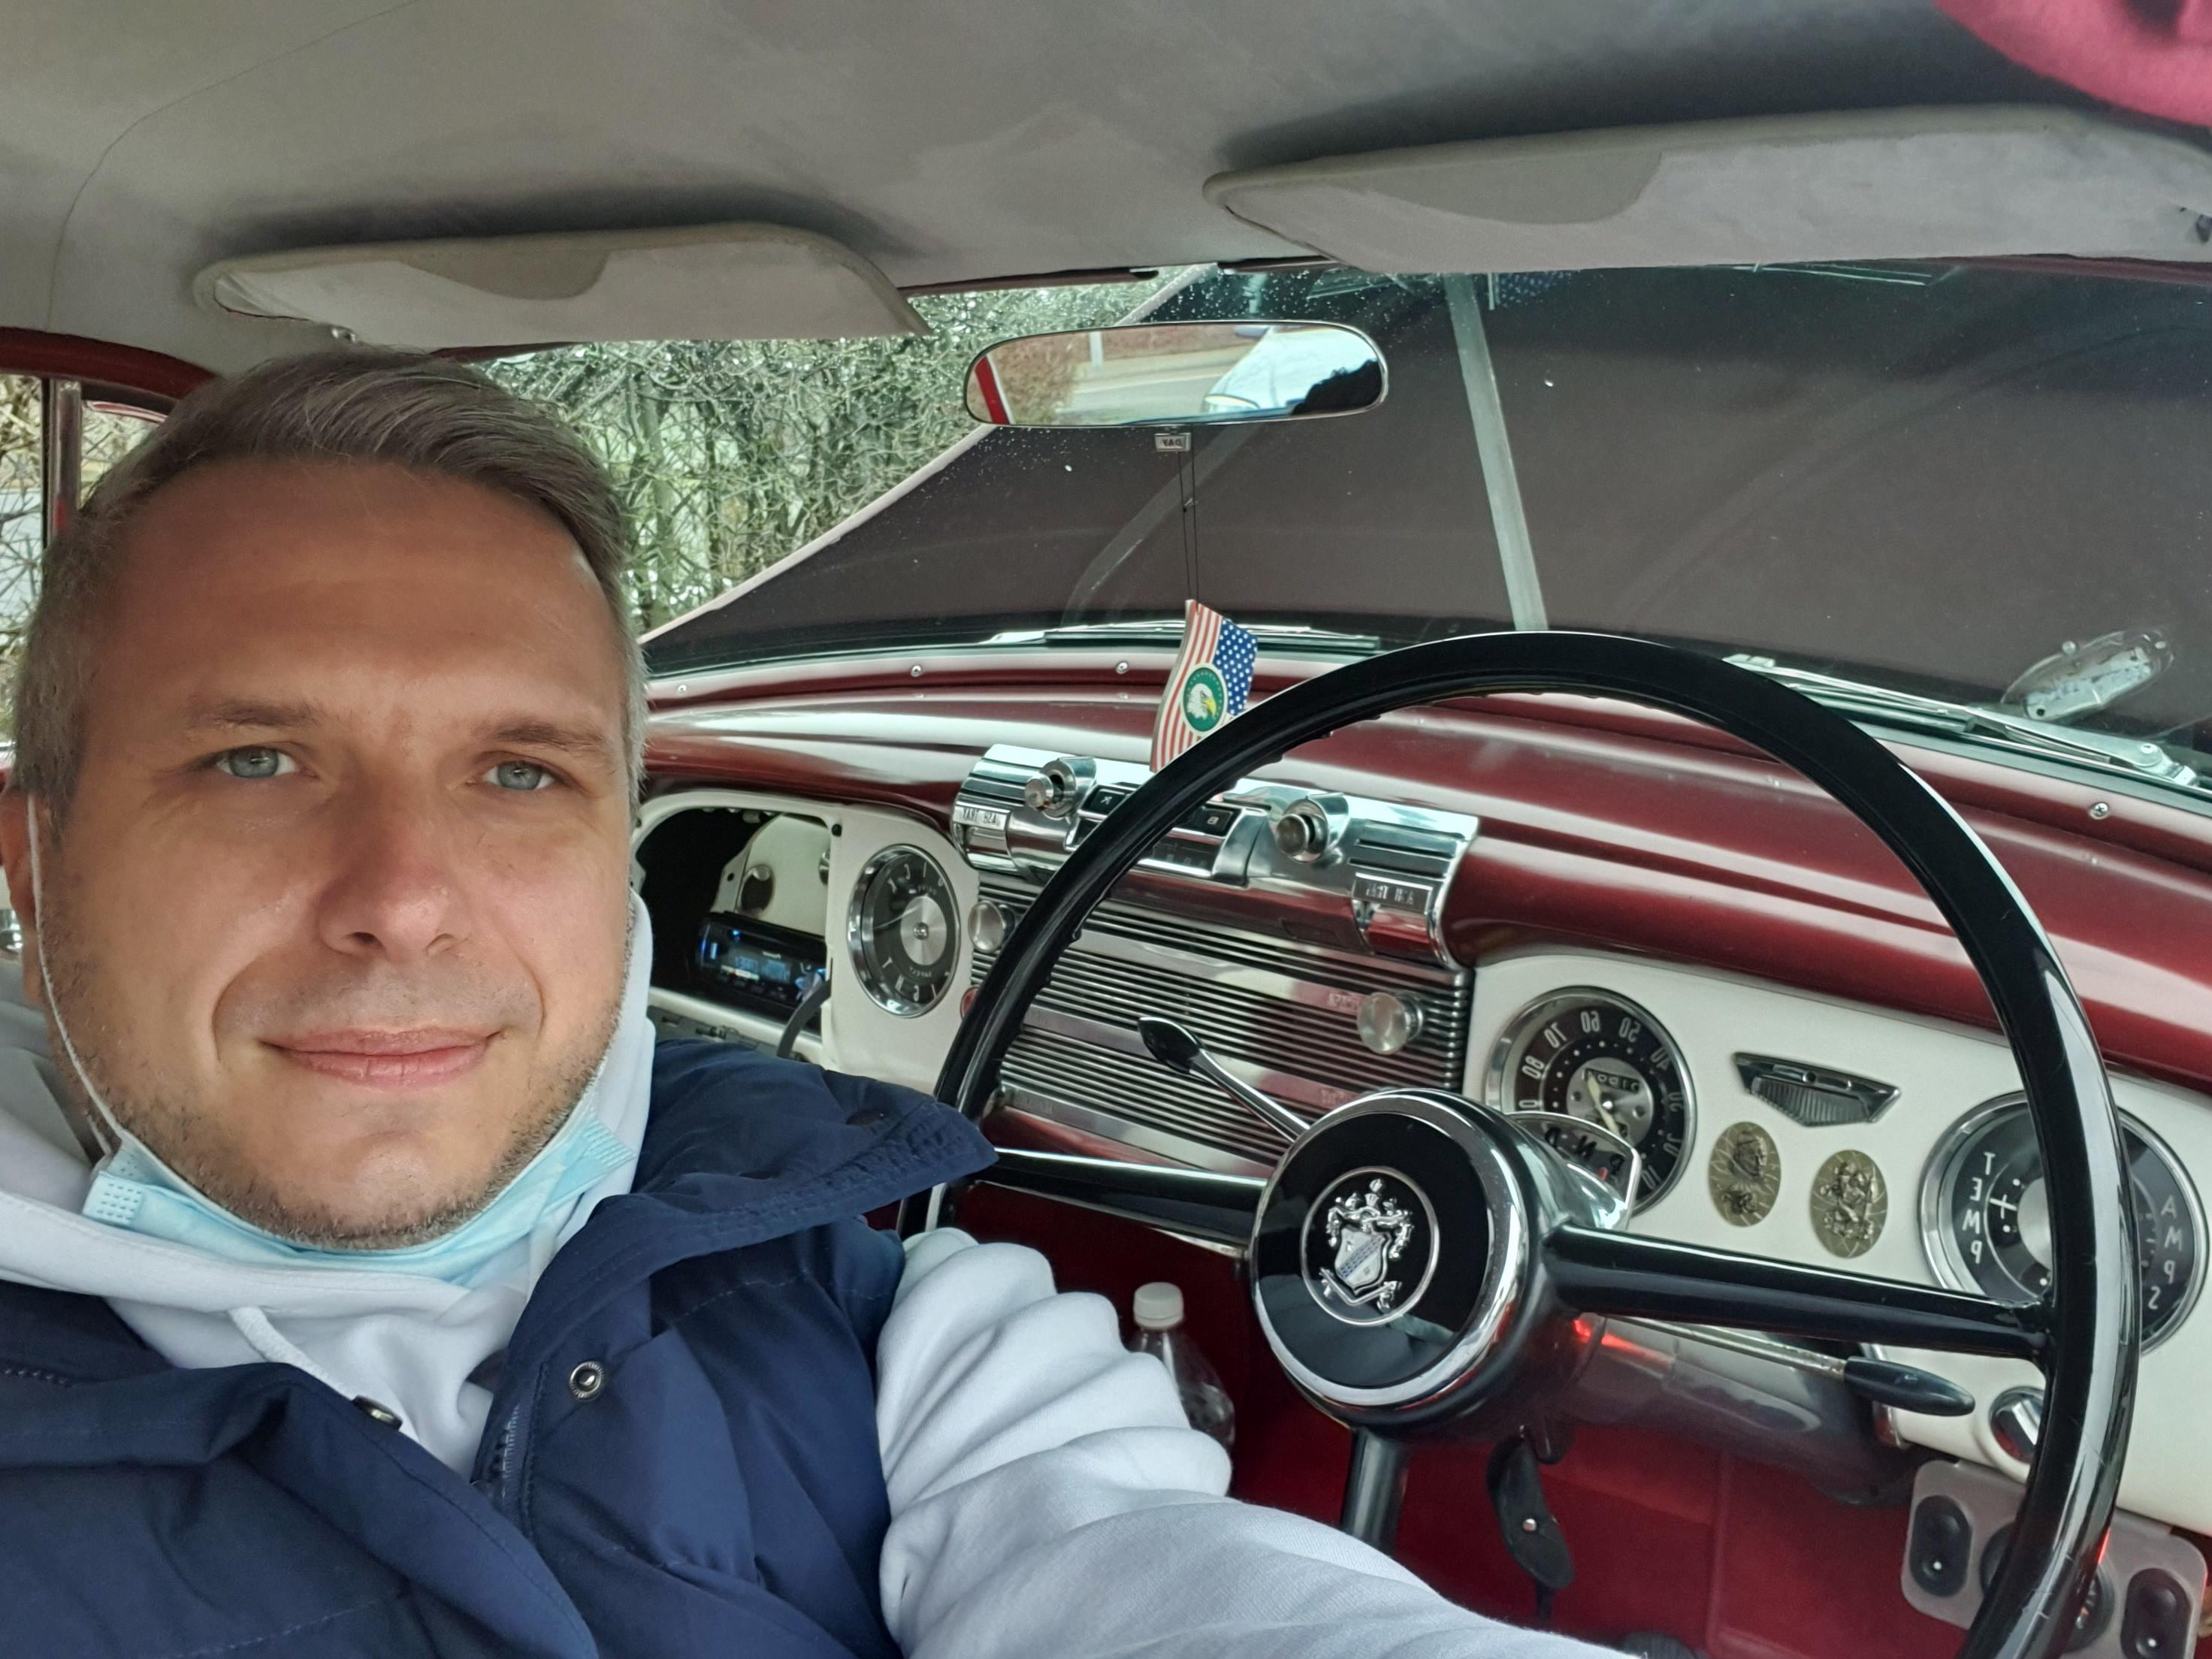 Buick_dzien_otwarty_do_slubu_2021_03_6